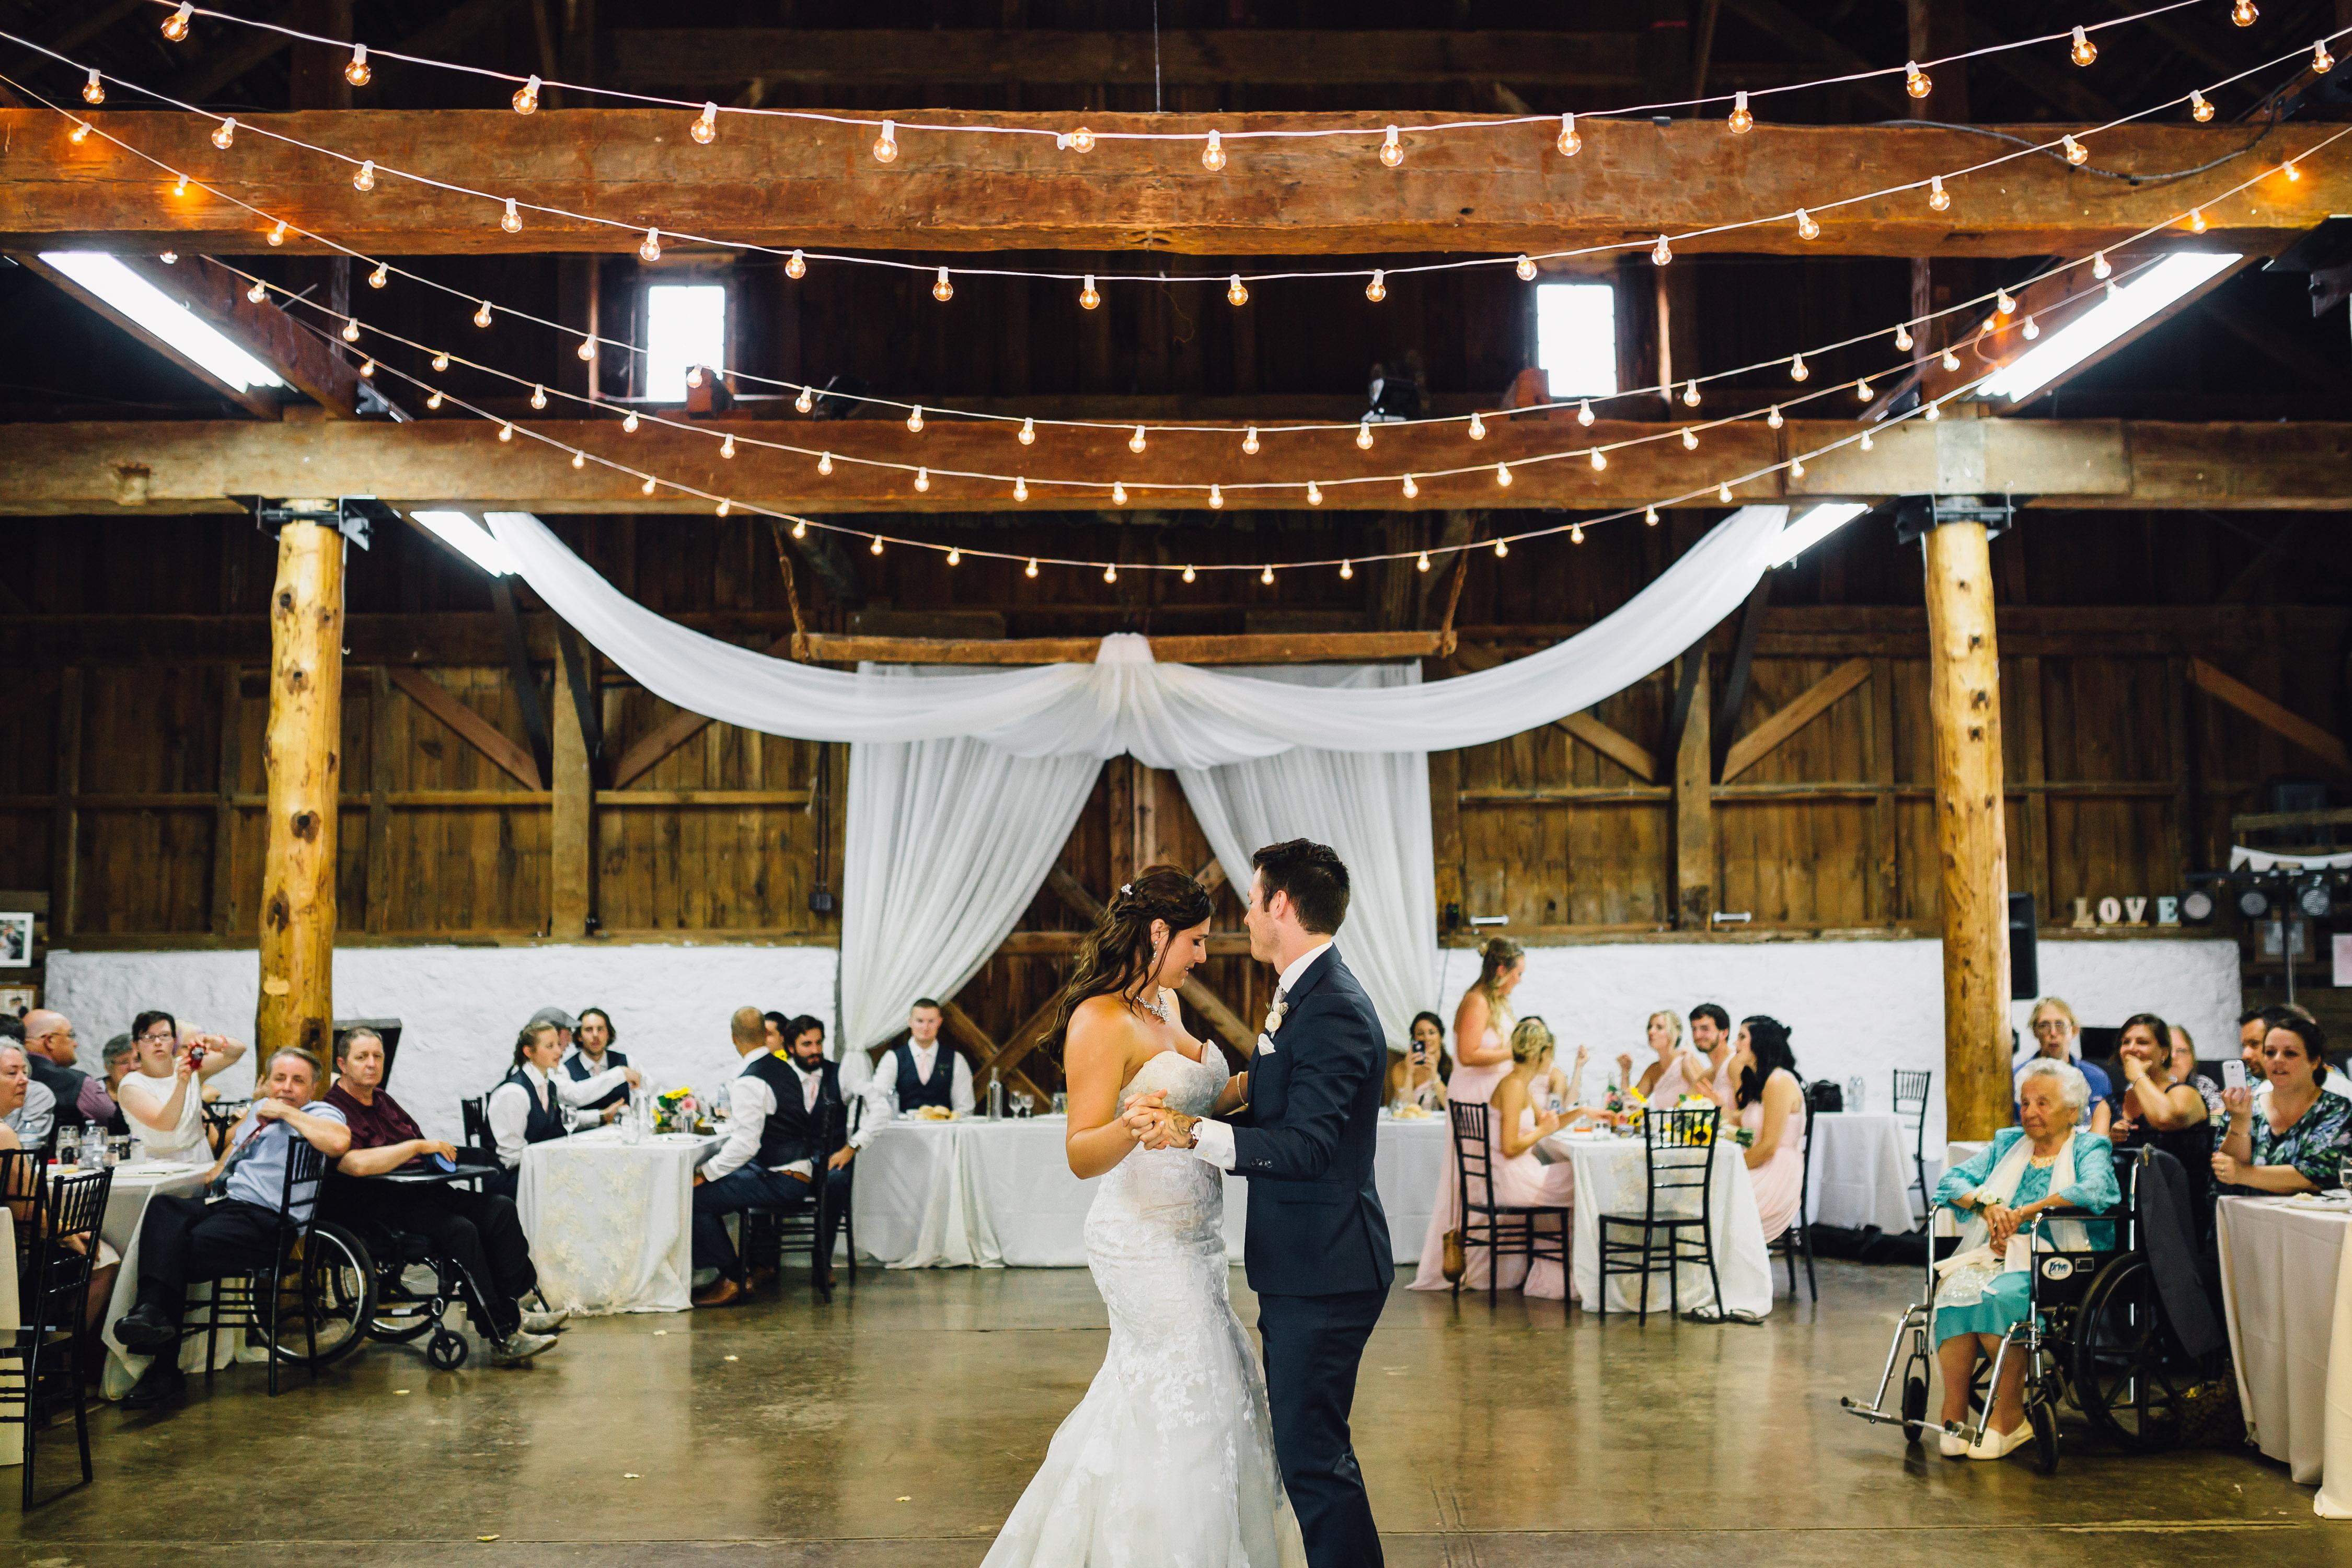 chair covers for weddings big lots desk wedding reception - ball's falls jordan, ontario